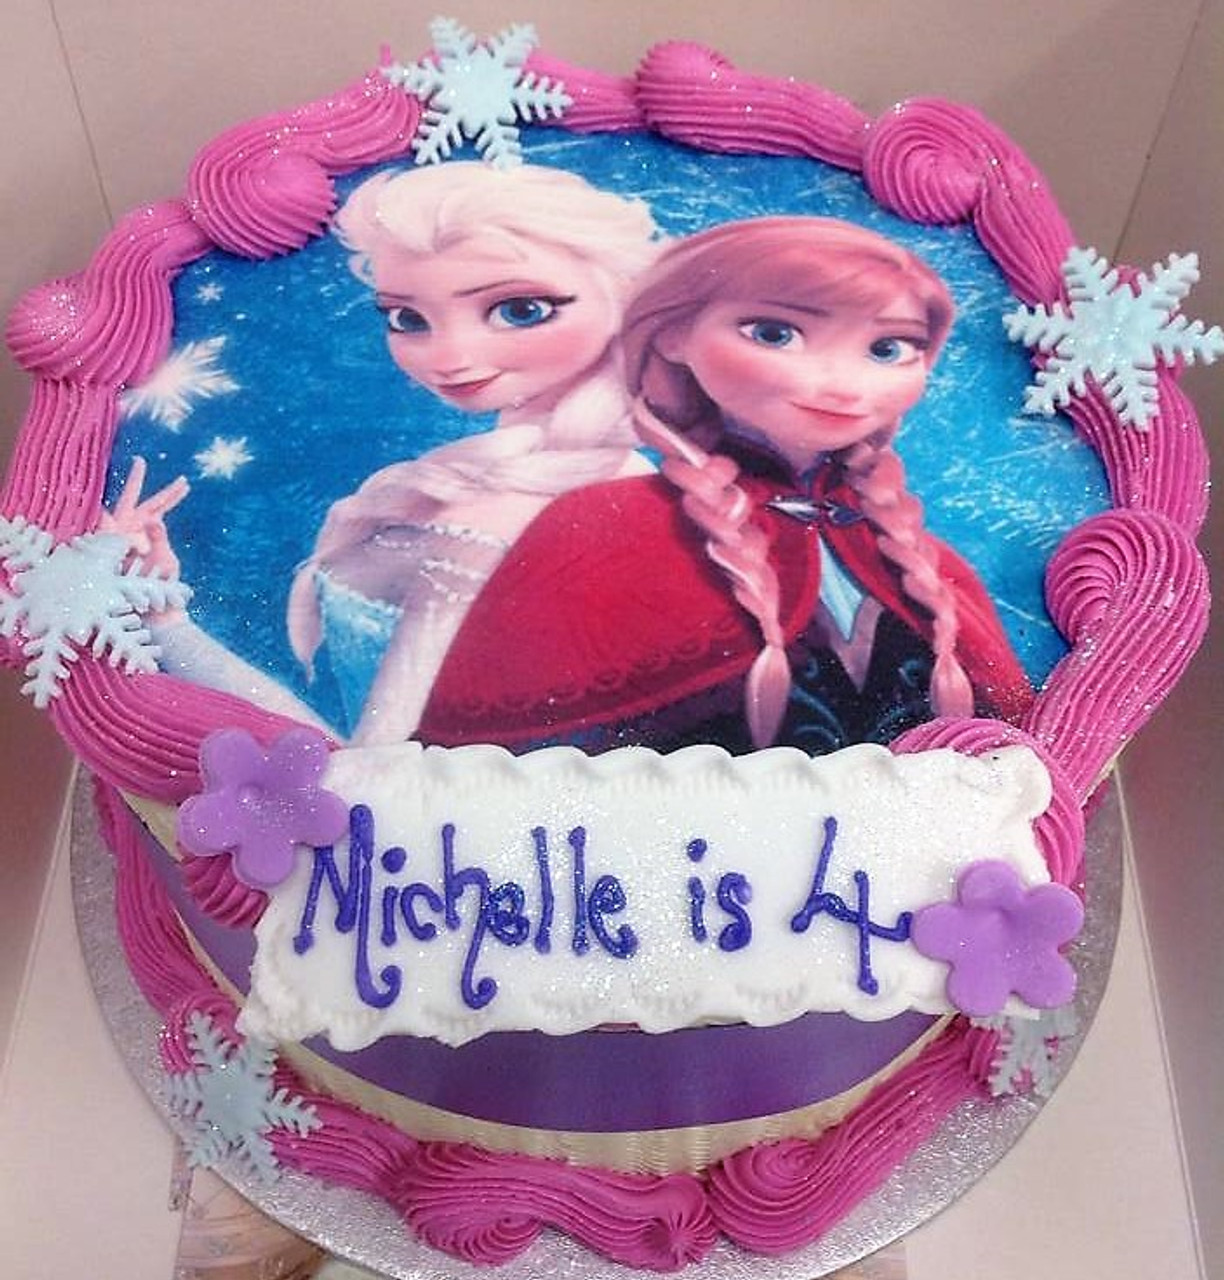 Terrific Frozen Birthday Cake For Girls Aberdeen Personalised Birthday Cards Paralily Jamesorg